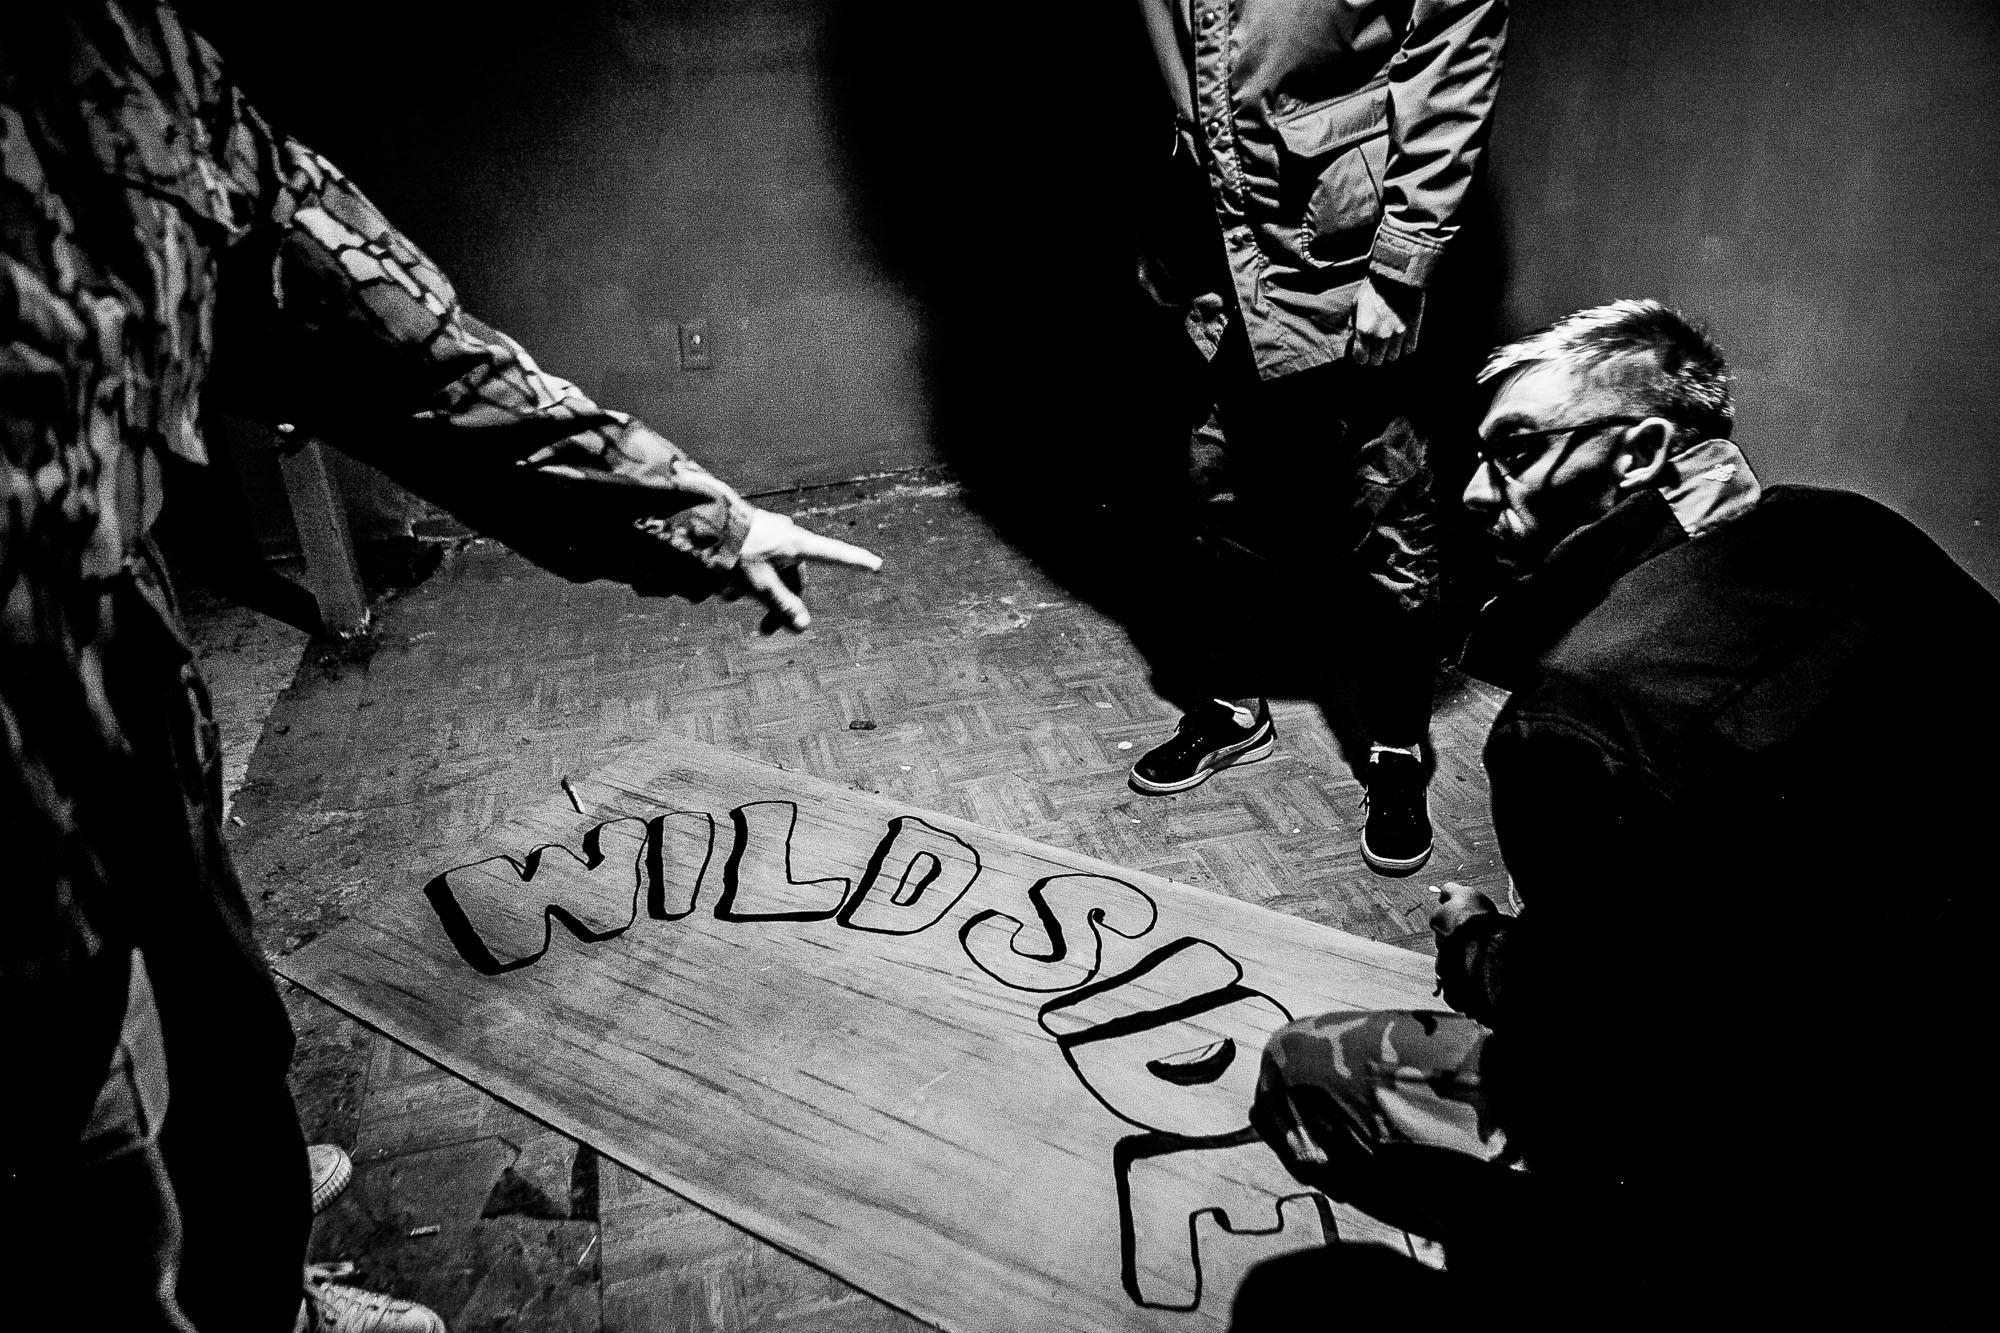 wildside-7088.jpg